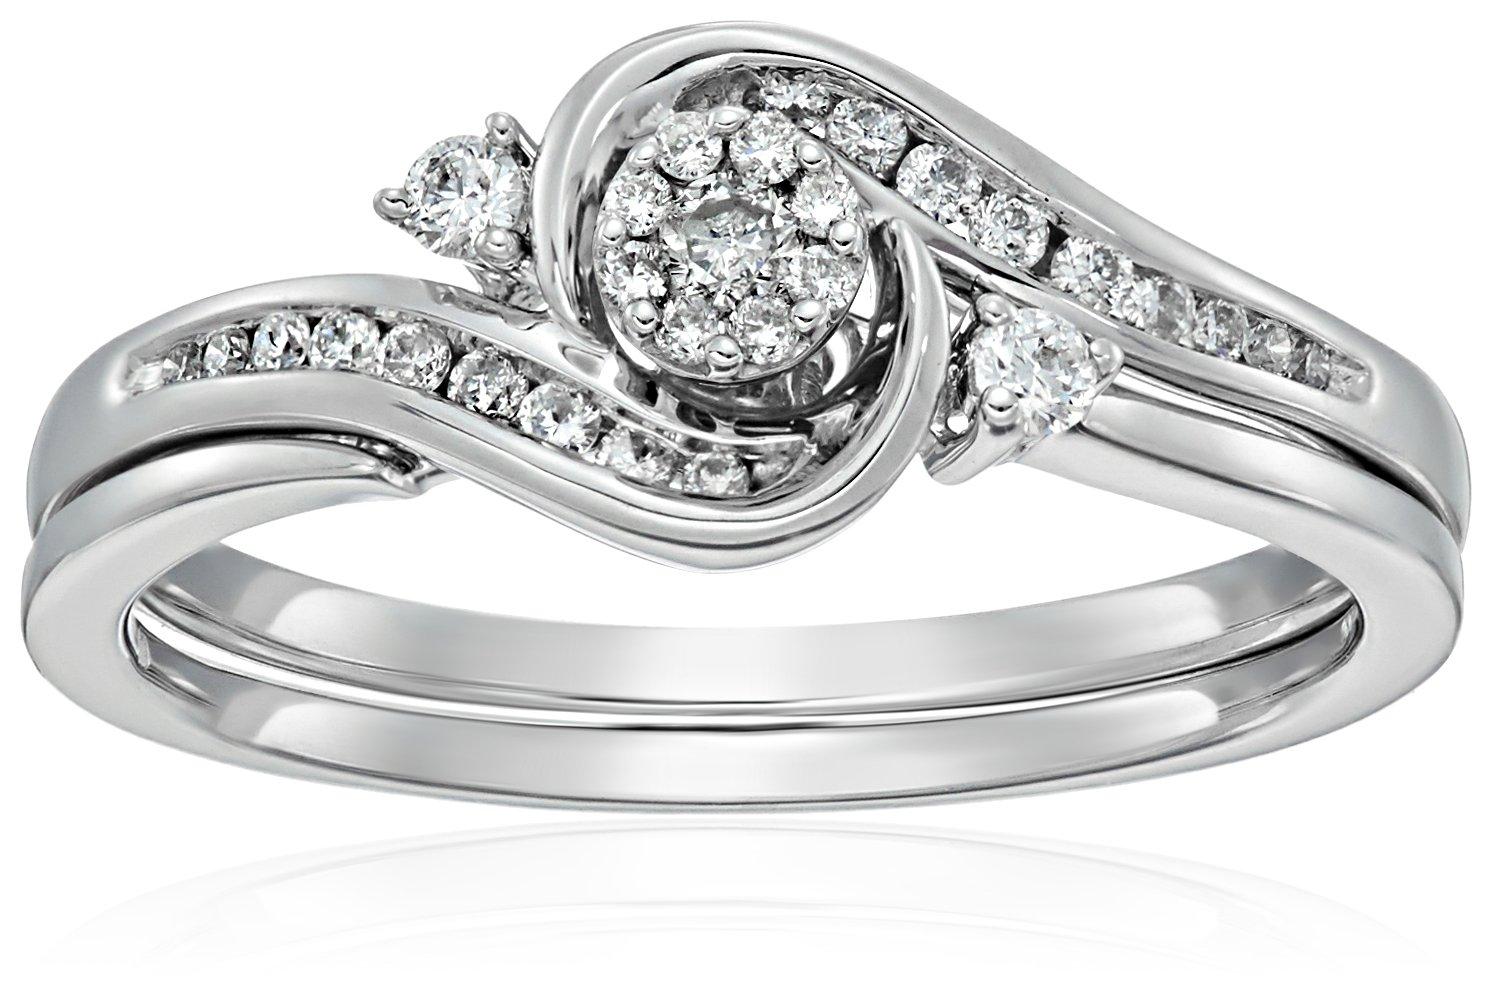 10k White Gold Round Cluster Top Diamond Twist with Interlocking Band Bridal Set (0.25 cttw I-J Color, I2-I3 Clarity), Size 7,white,